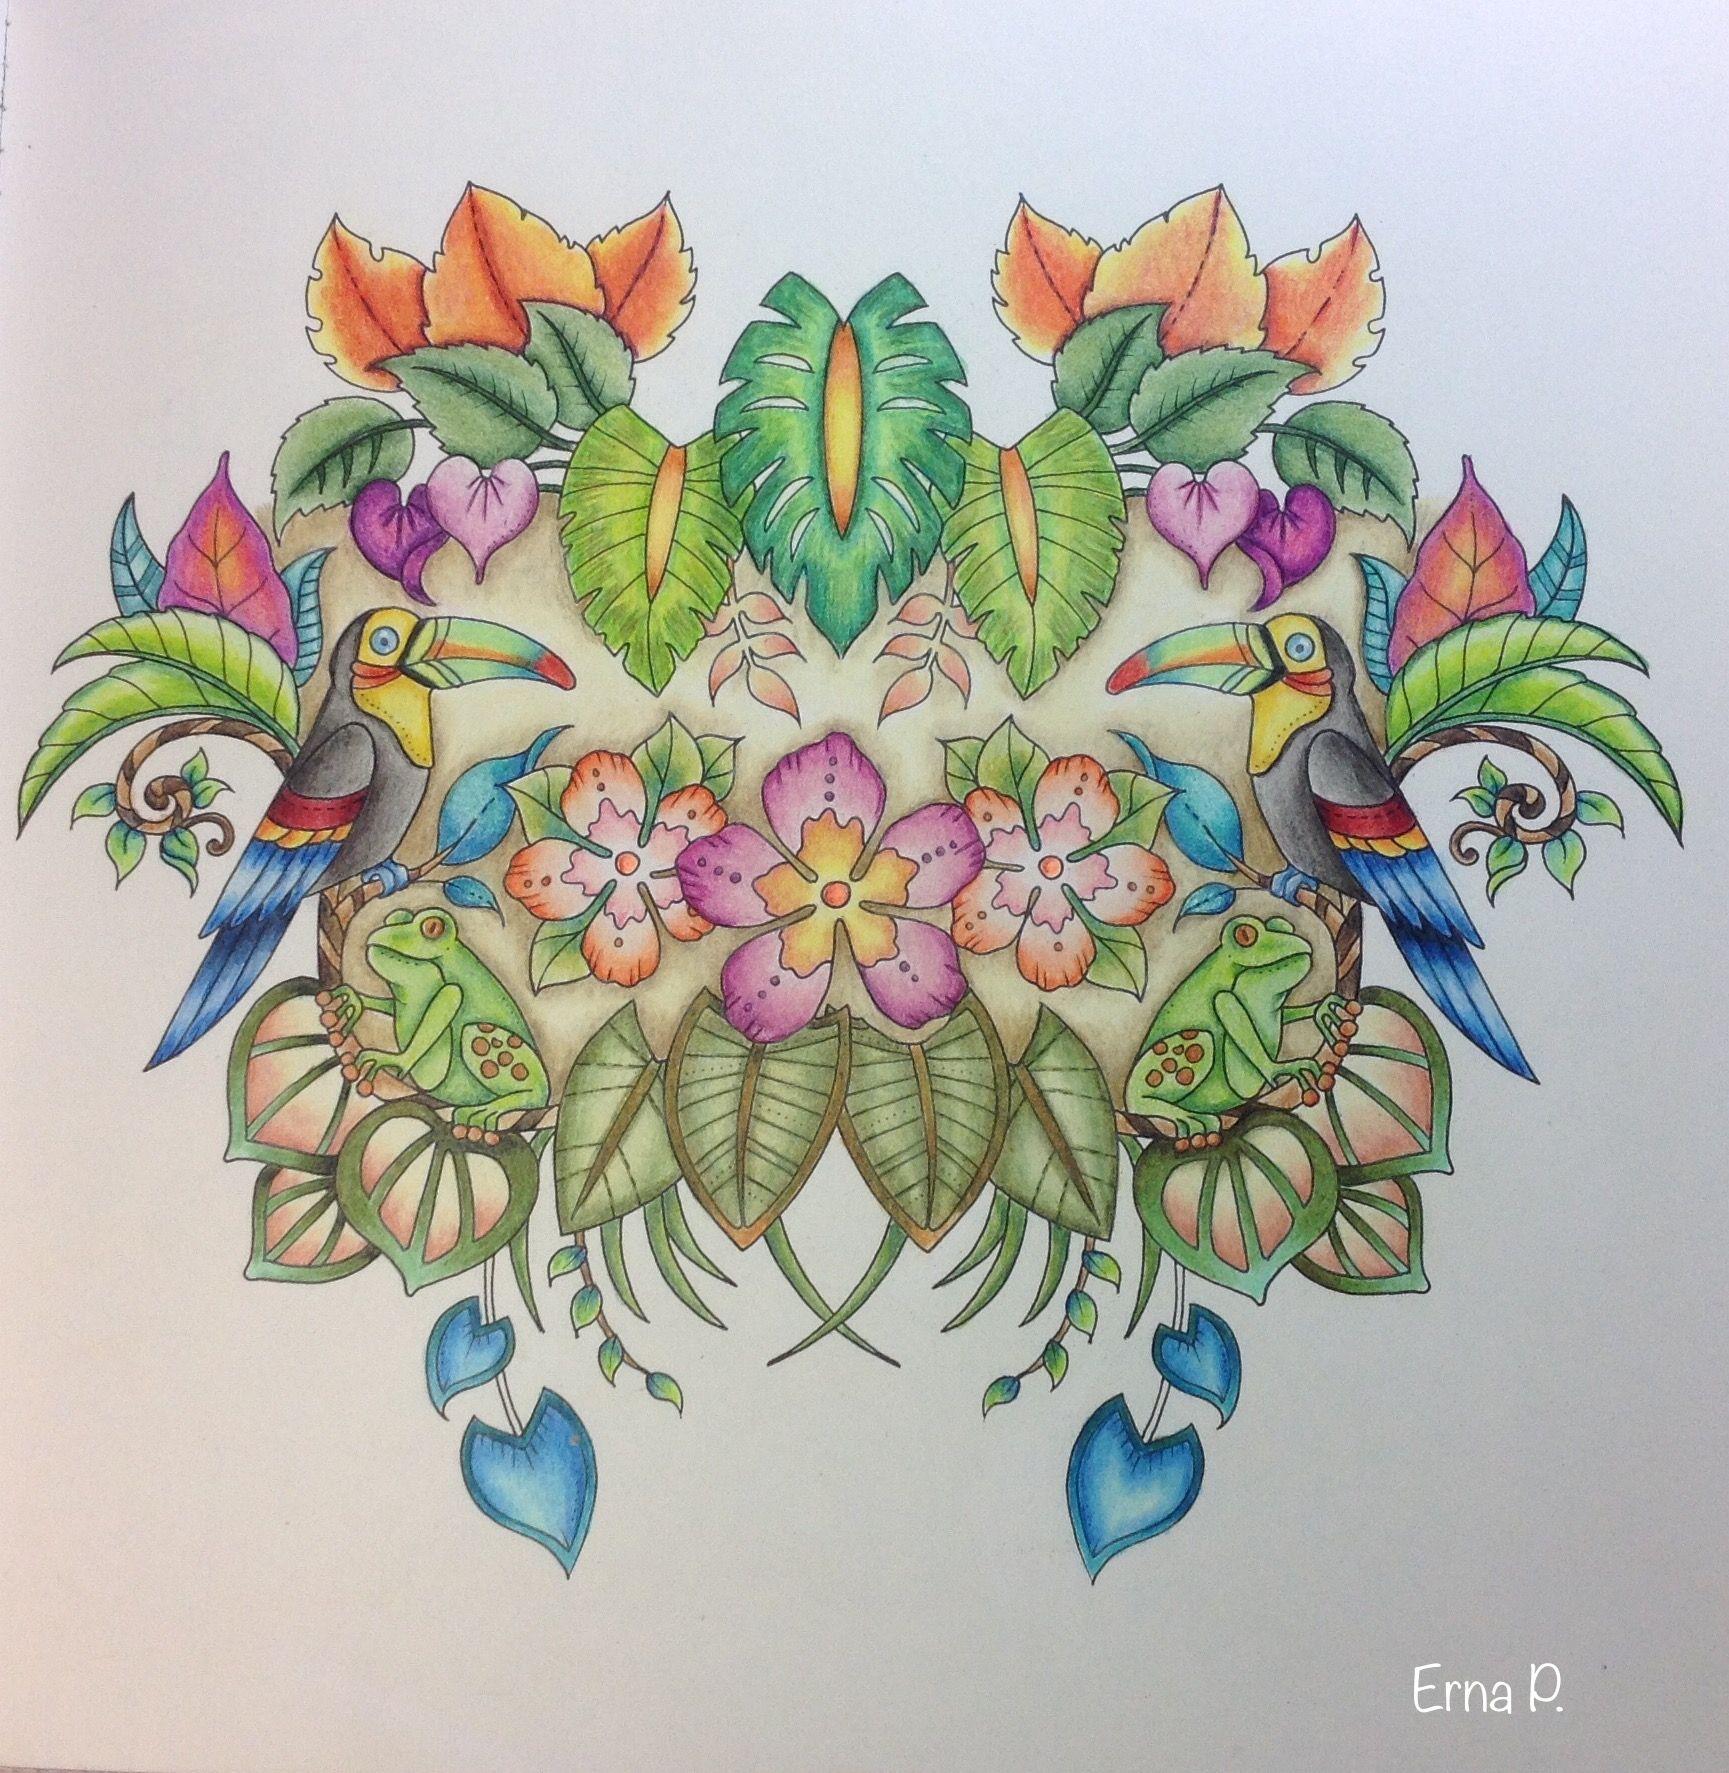 pin by erna piatek on magical jungle pinterest johanna basford